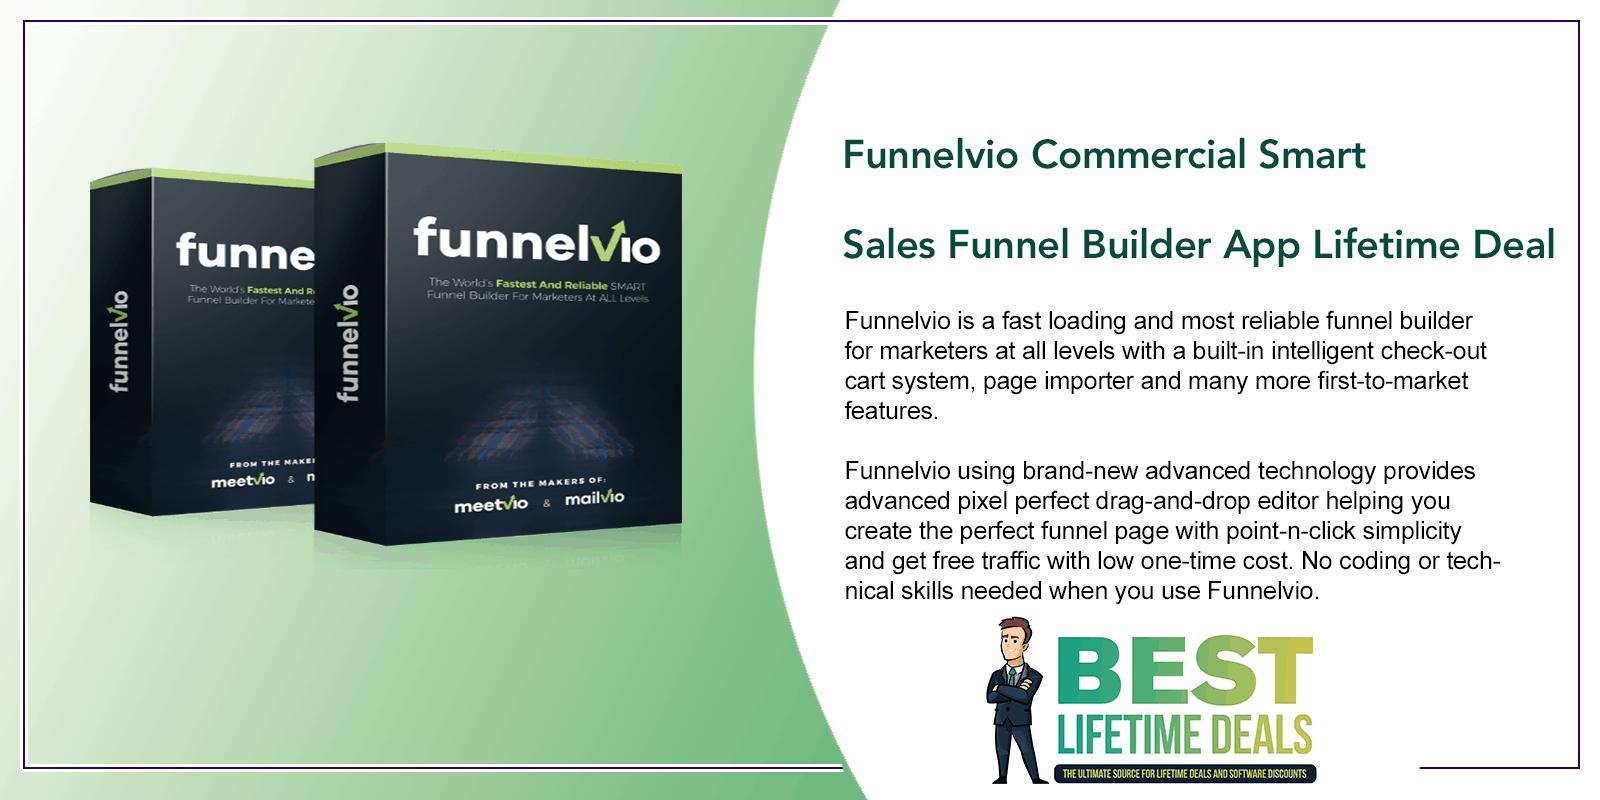 Funnelvio Commercial Smart Sales Funnel Builder App Featured Image